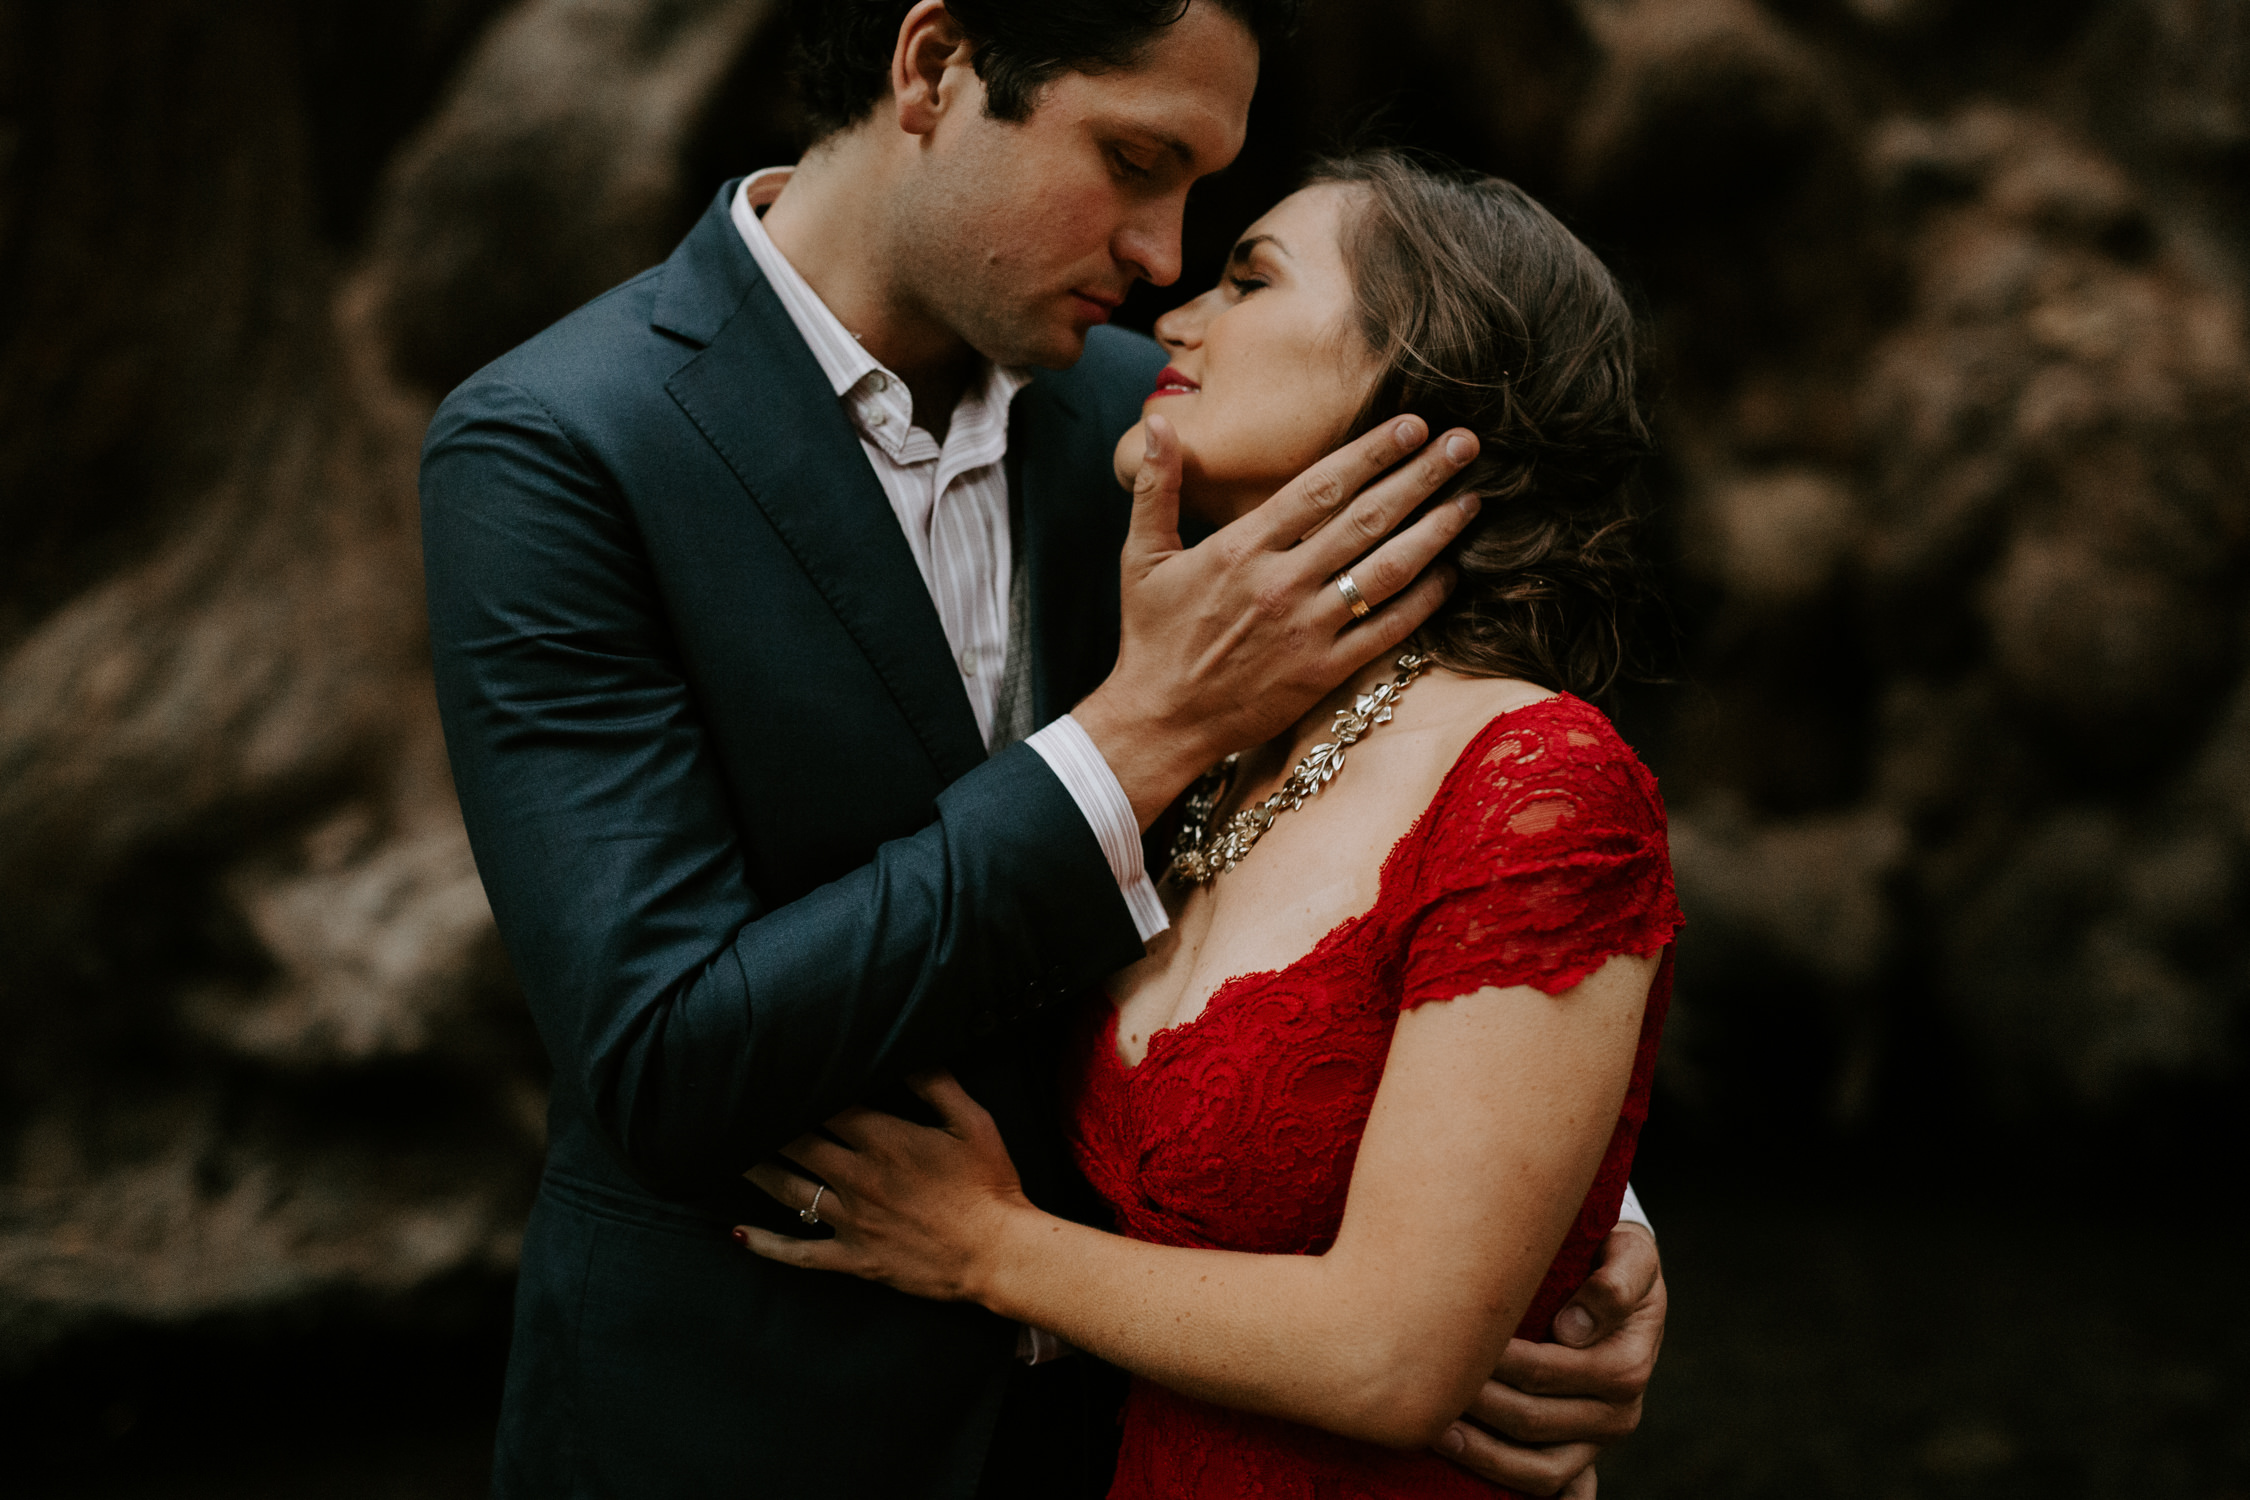 couple-intimate-engagement-session-mt-tam-39.jpg